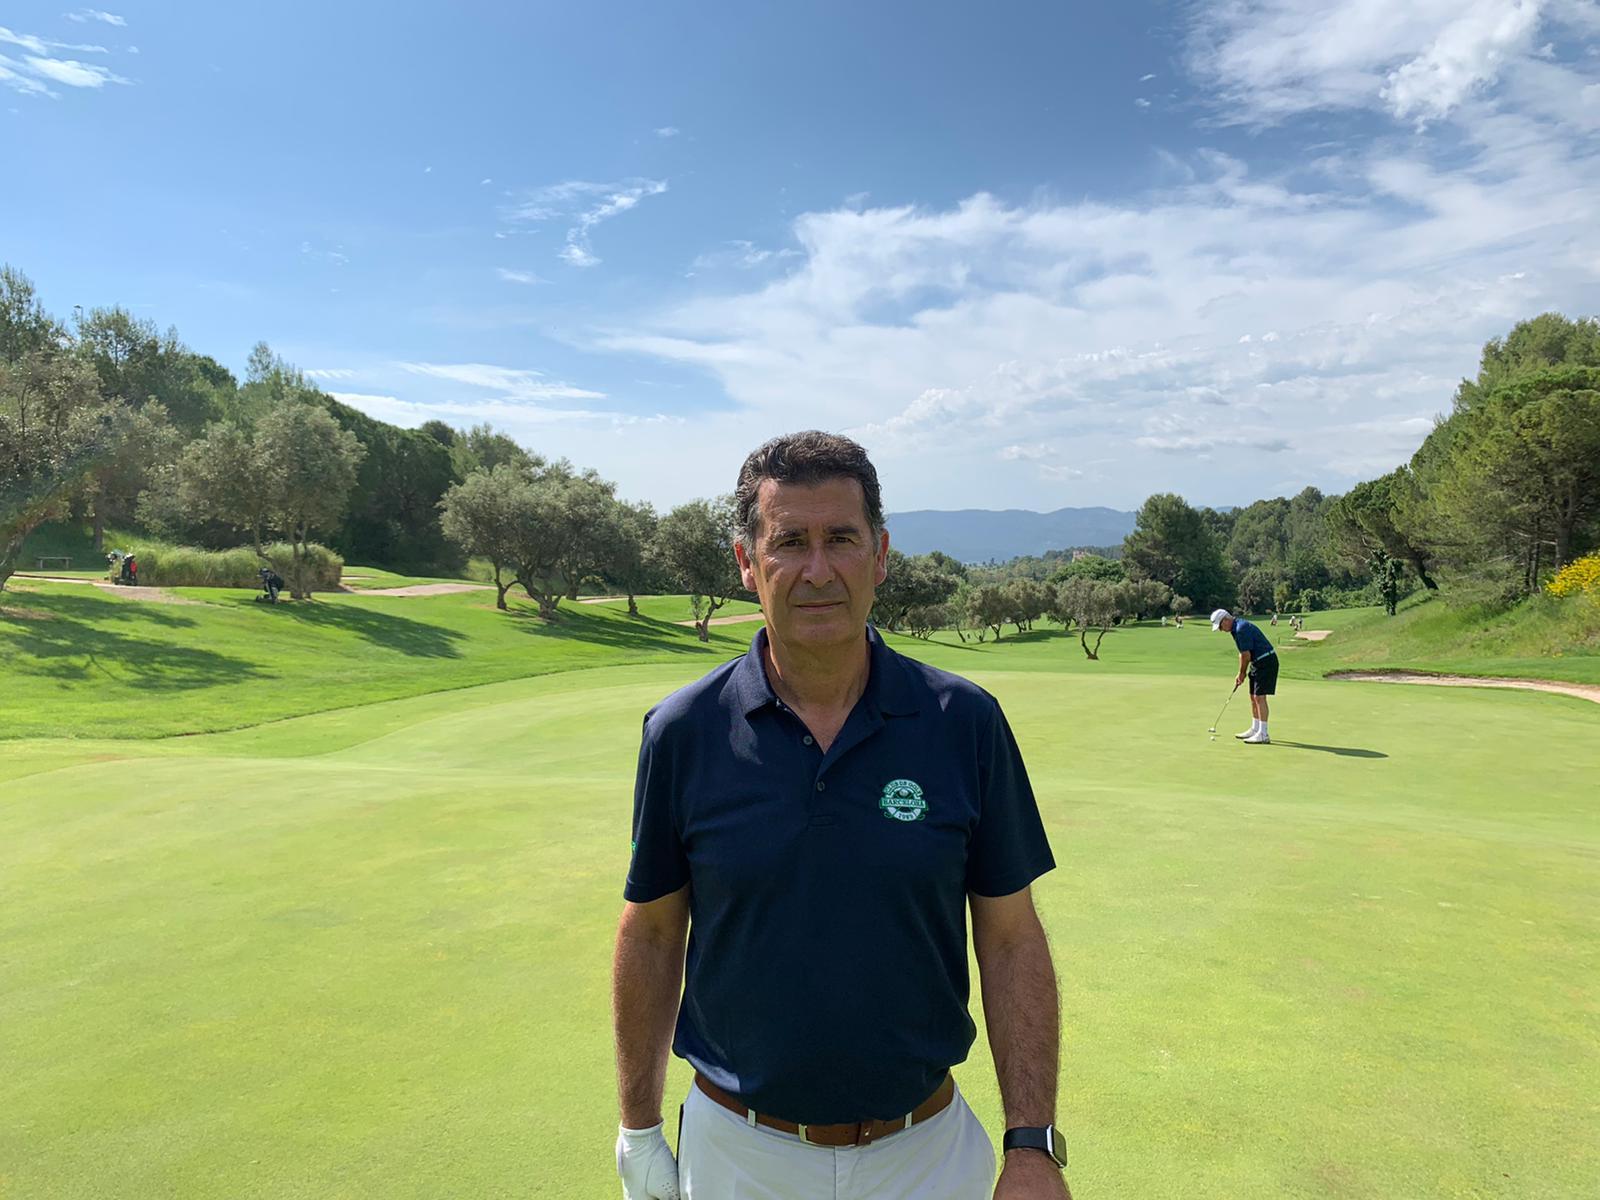 Entrevista de Joan Vidal a Santi Rosell, Presidente del Club de Golf Barcelona